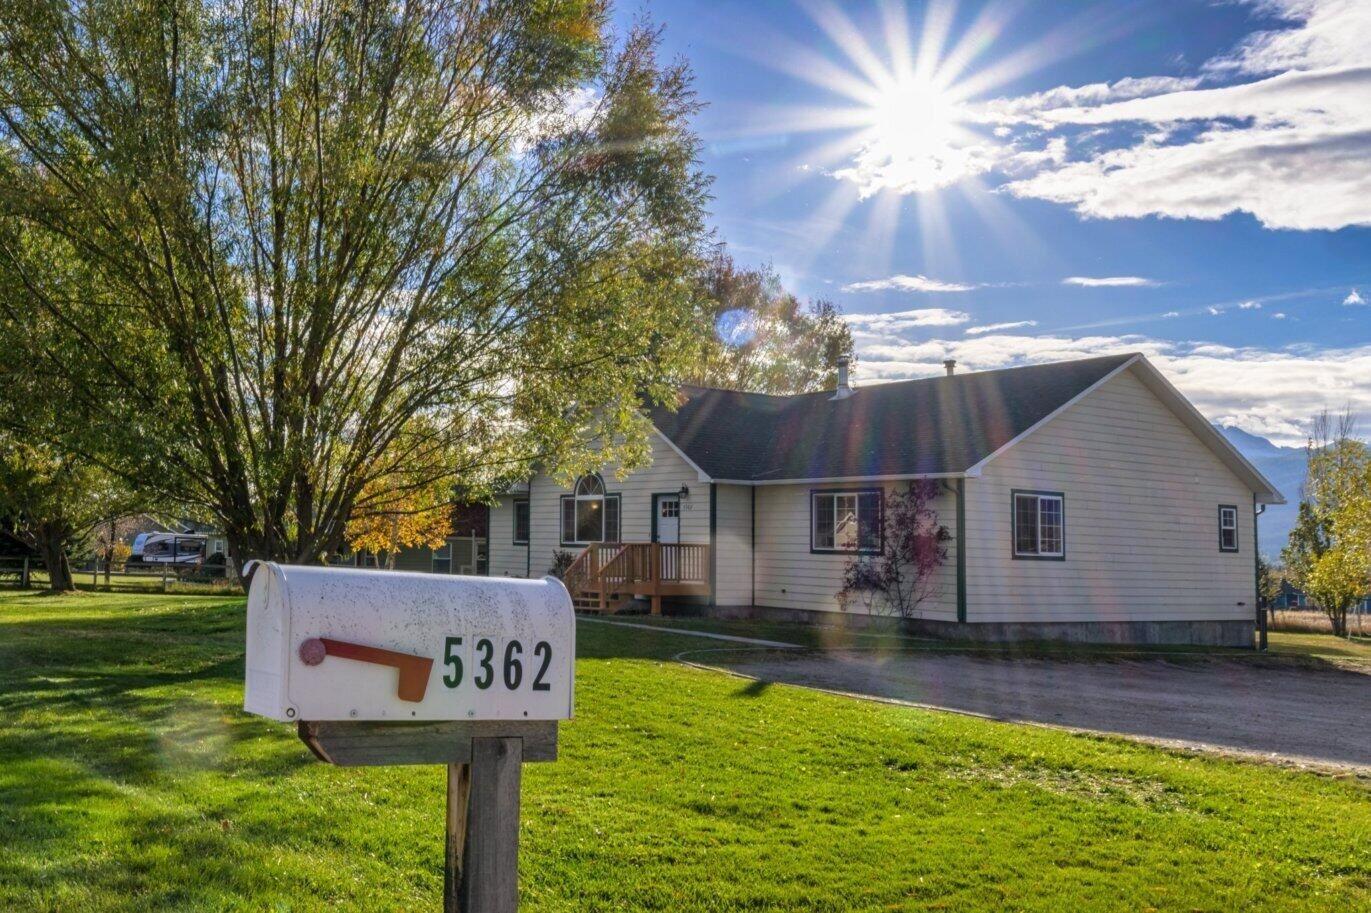 Photo of 5362 Spur Lane, Florence, MT 59833 (MLS # 22116441)